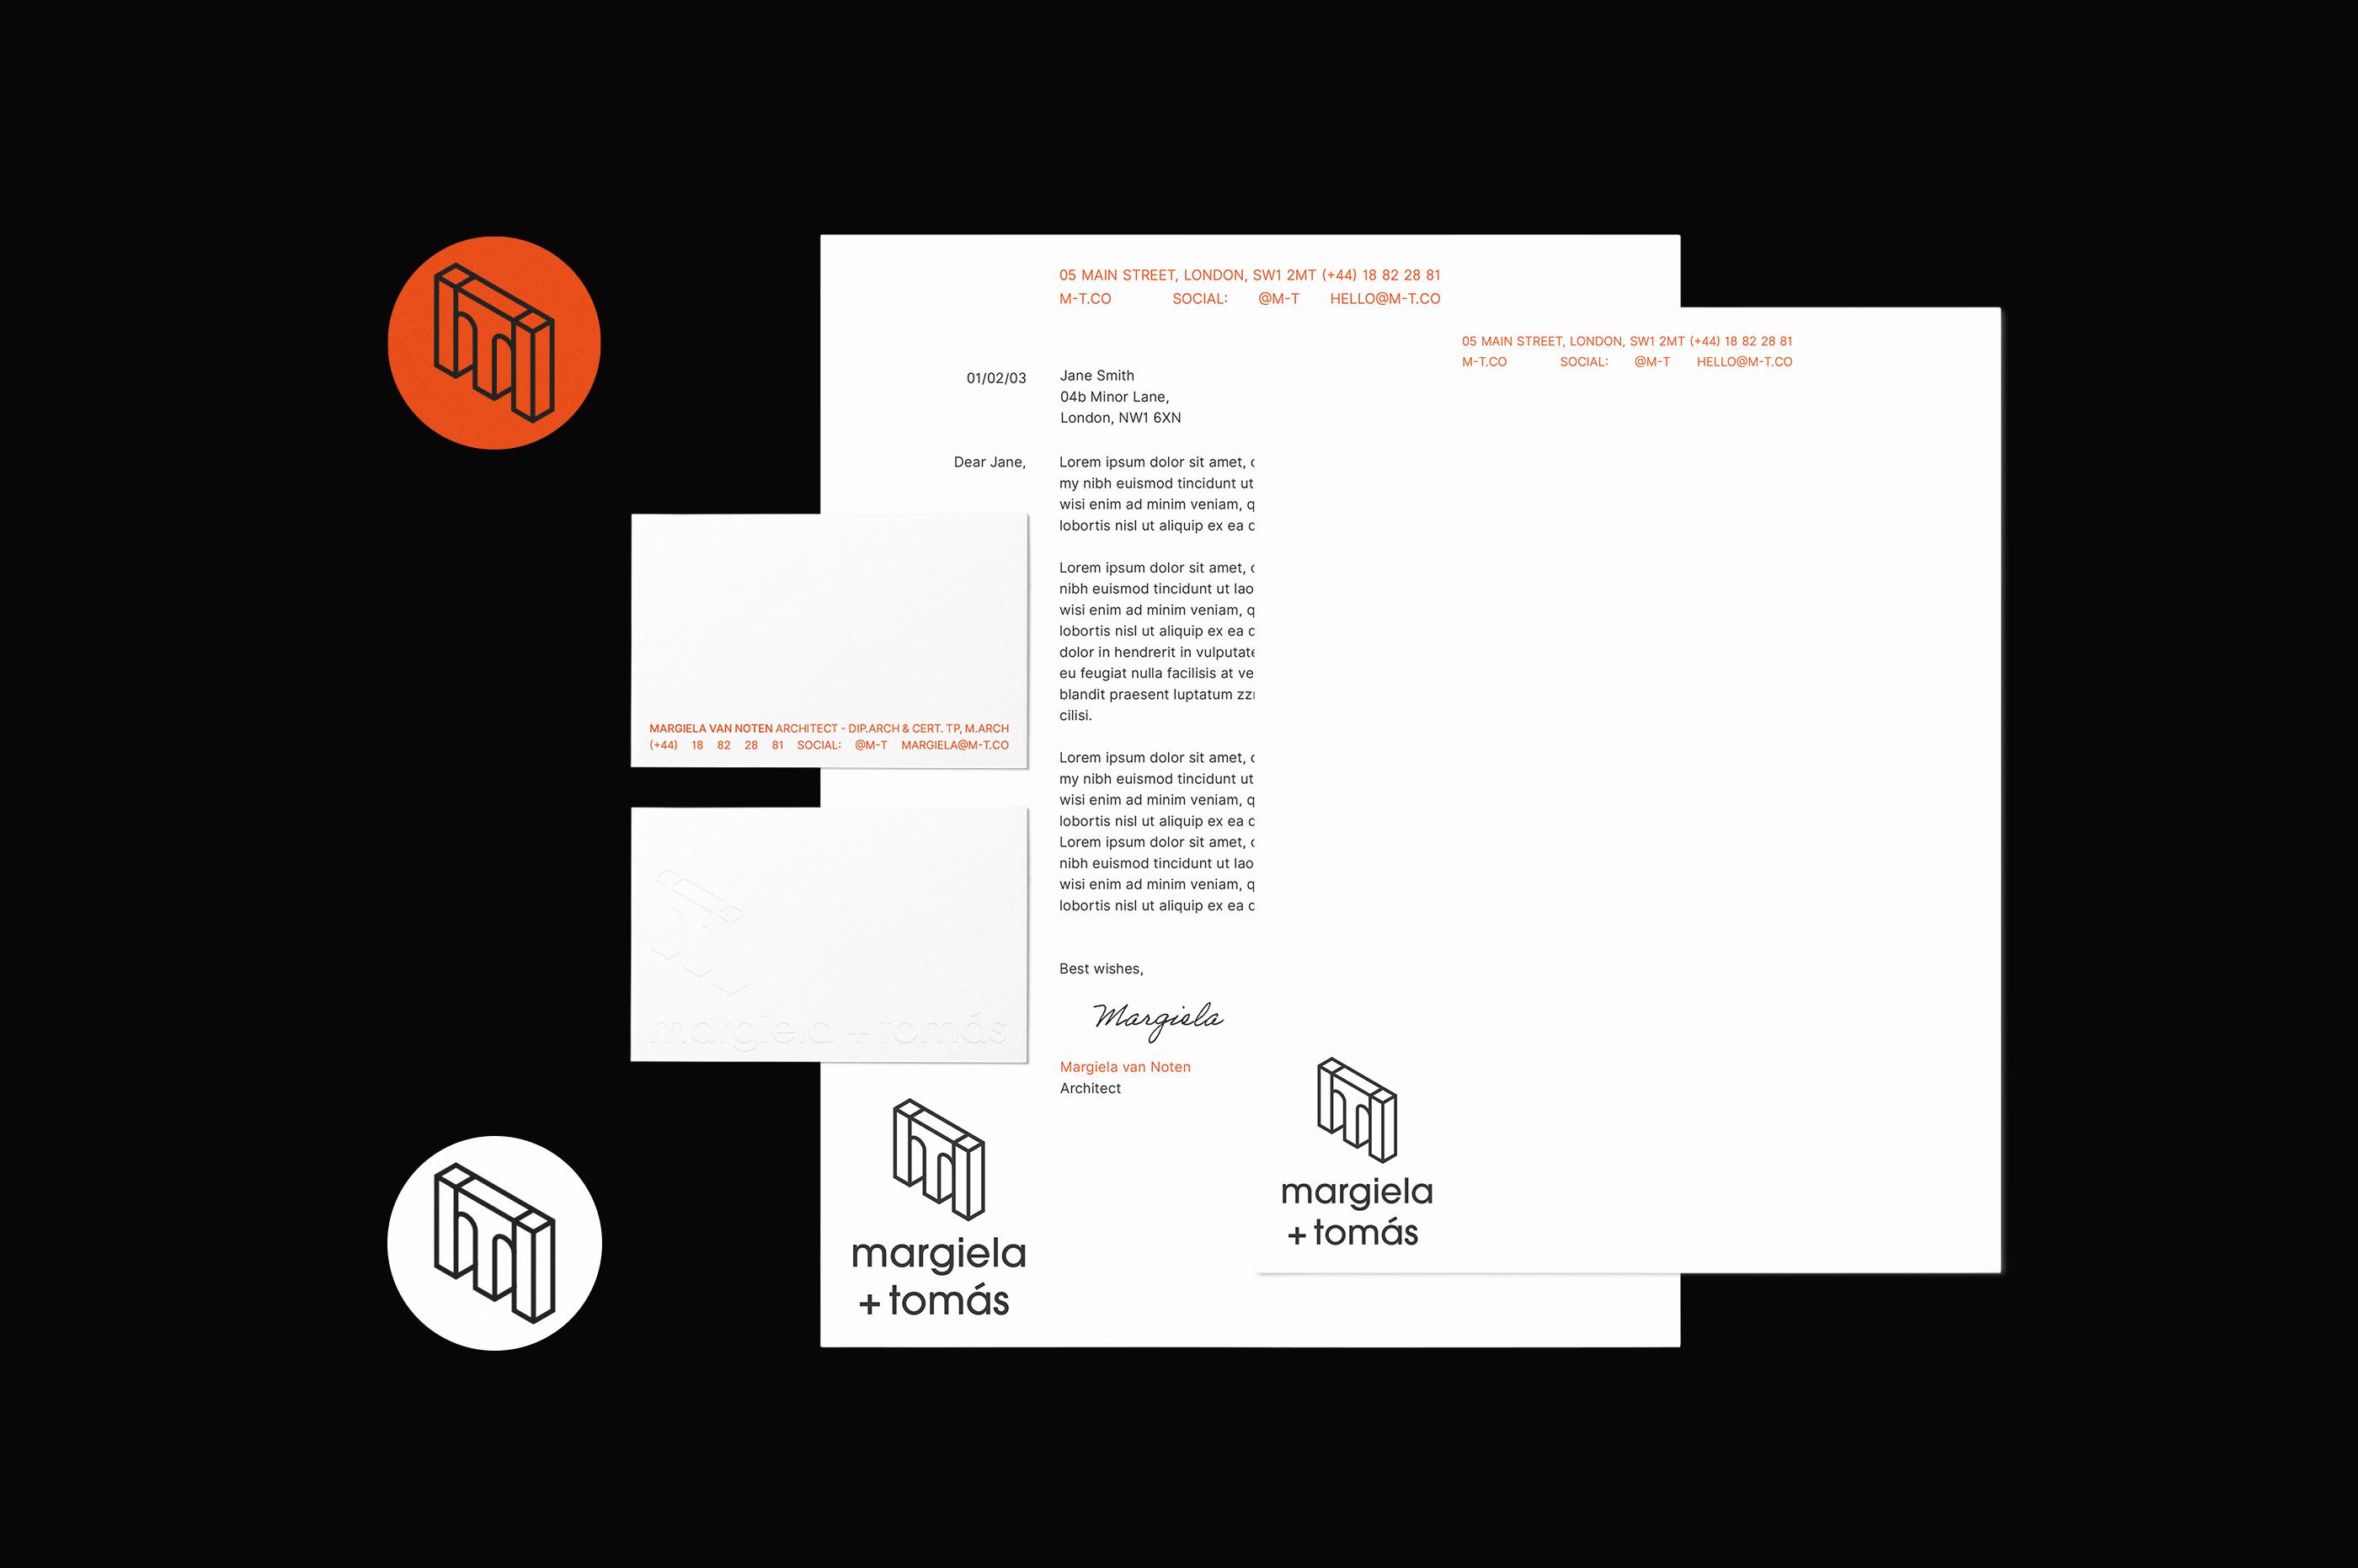 damian-herrington-brand-identity-mt-14